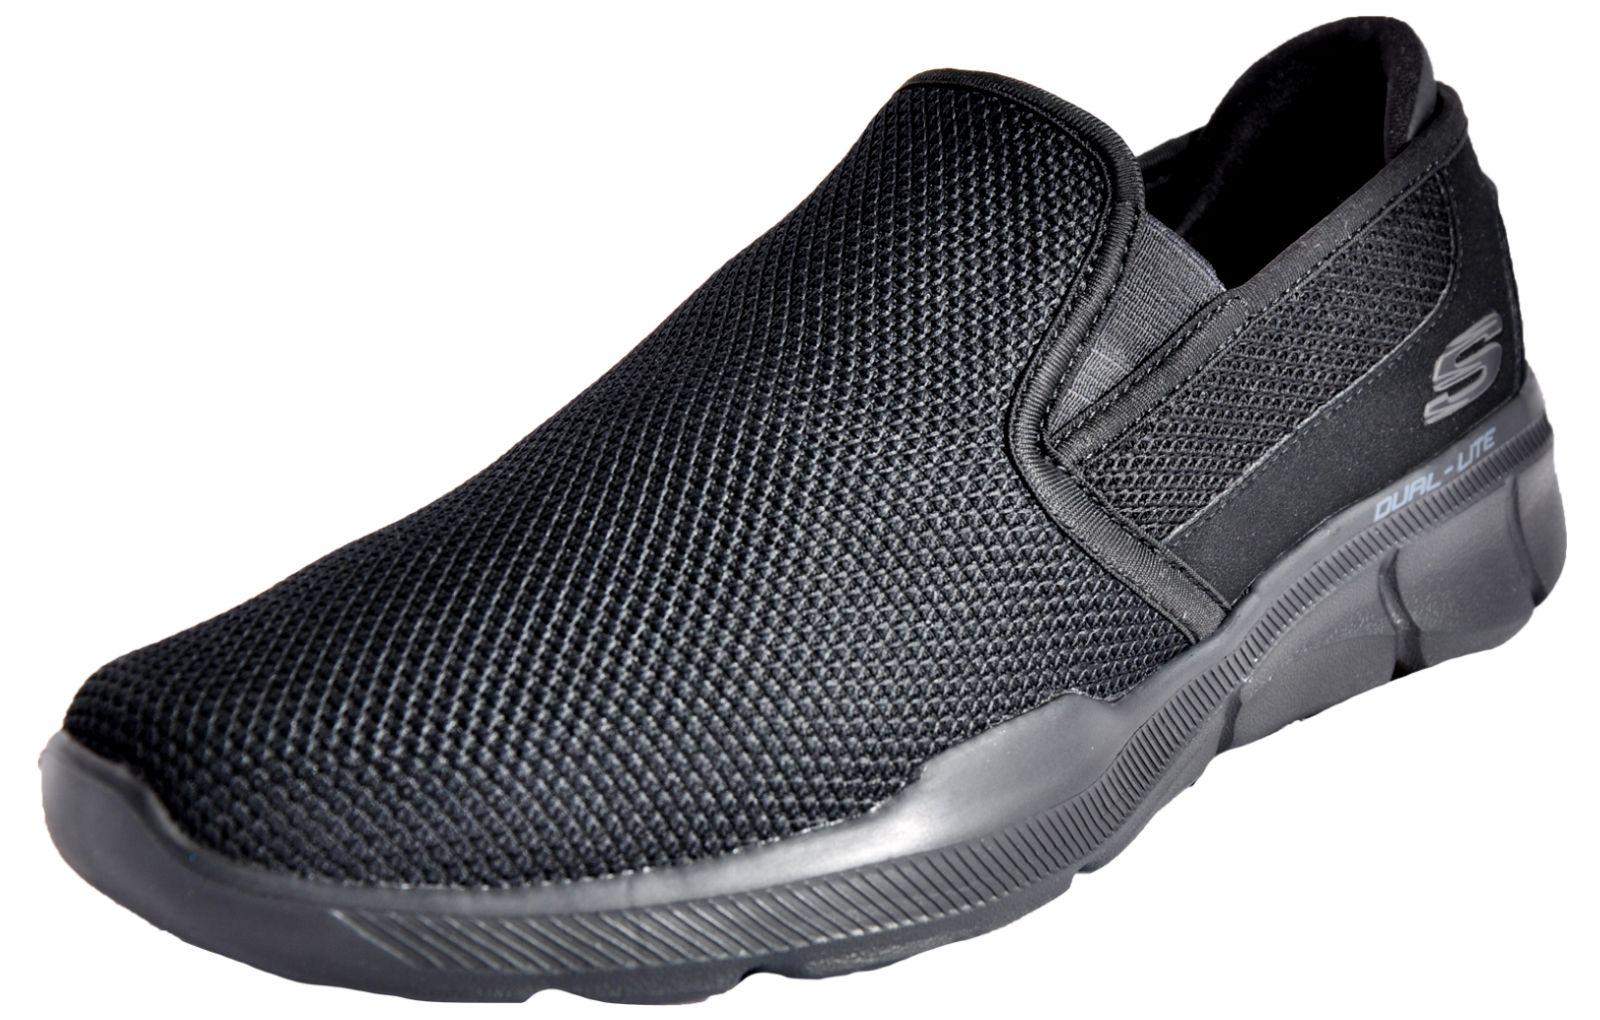 Skechers Equalizer 3.0 Memory Foam Mens